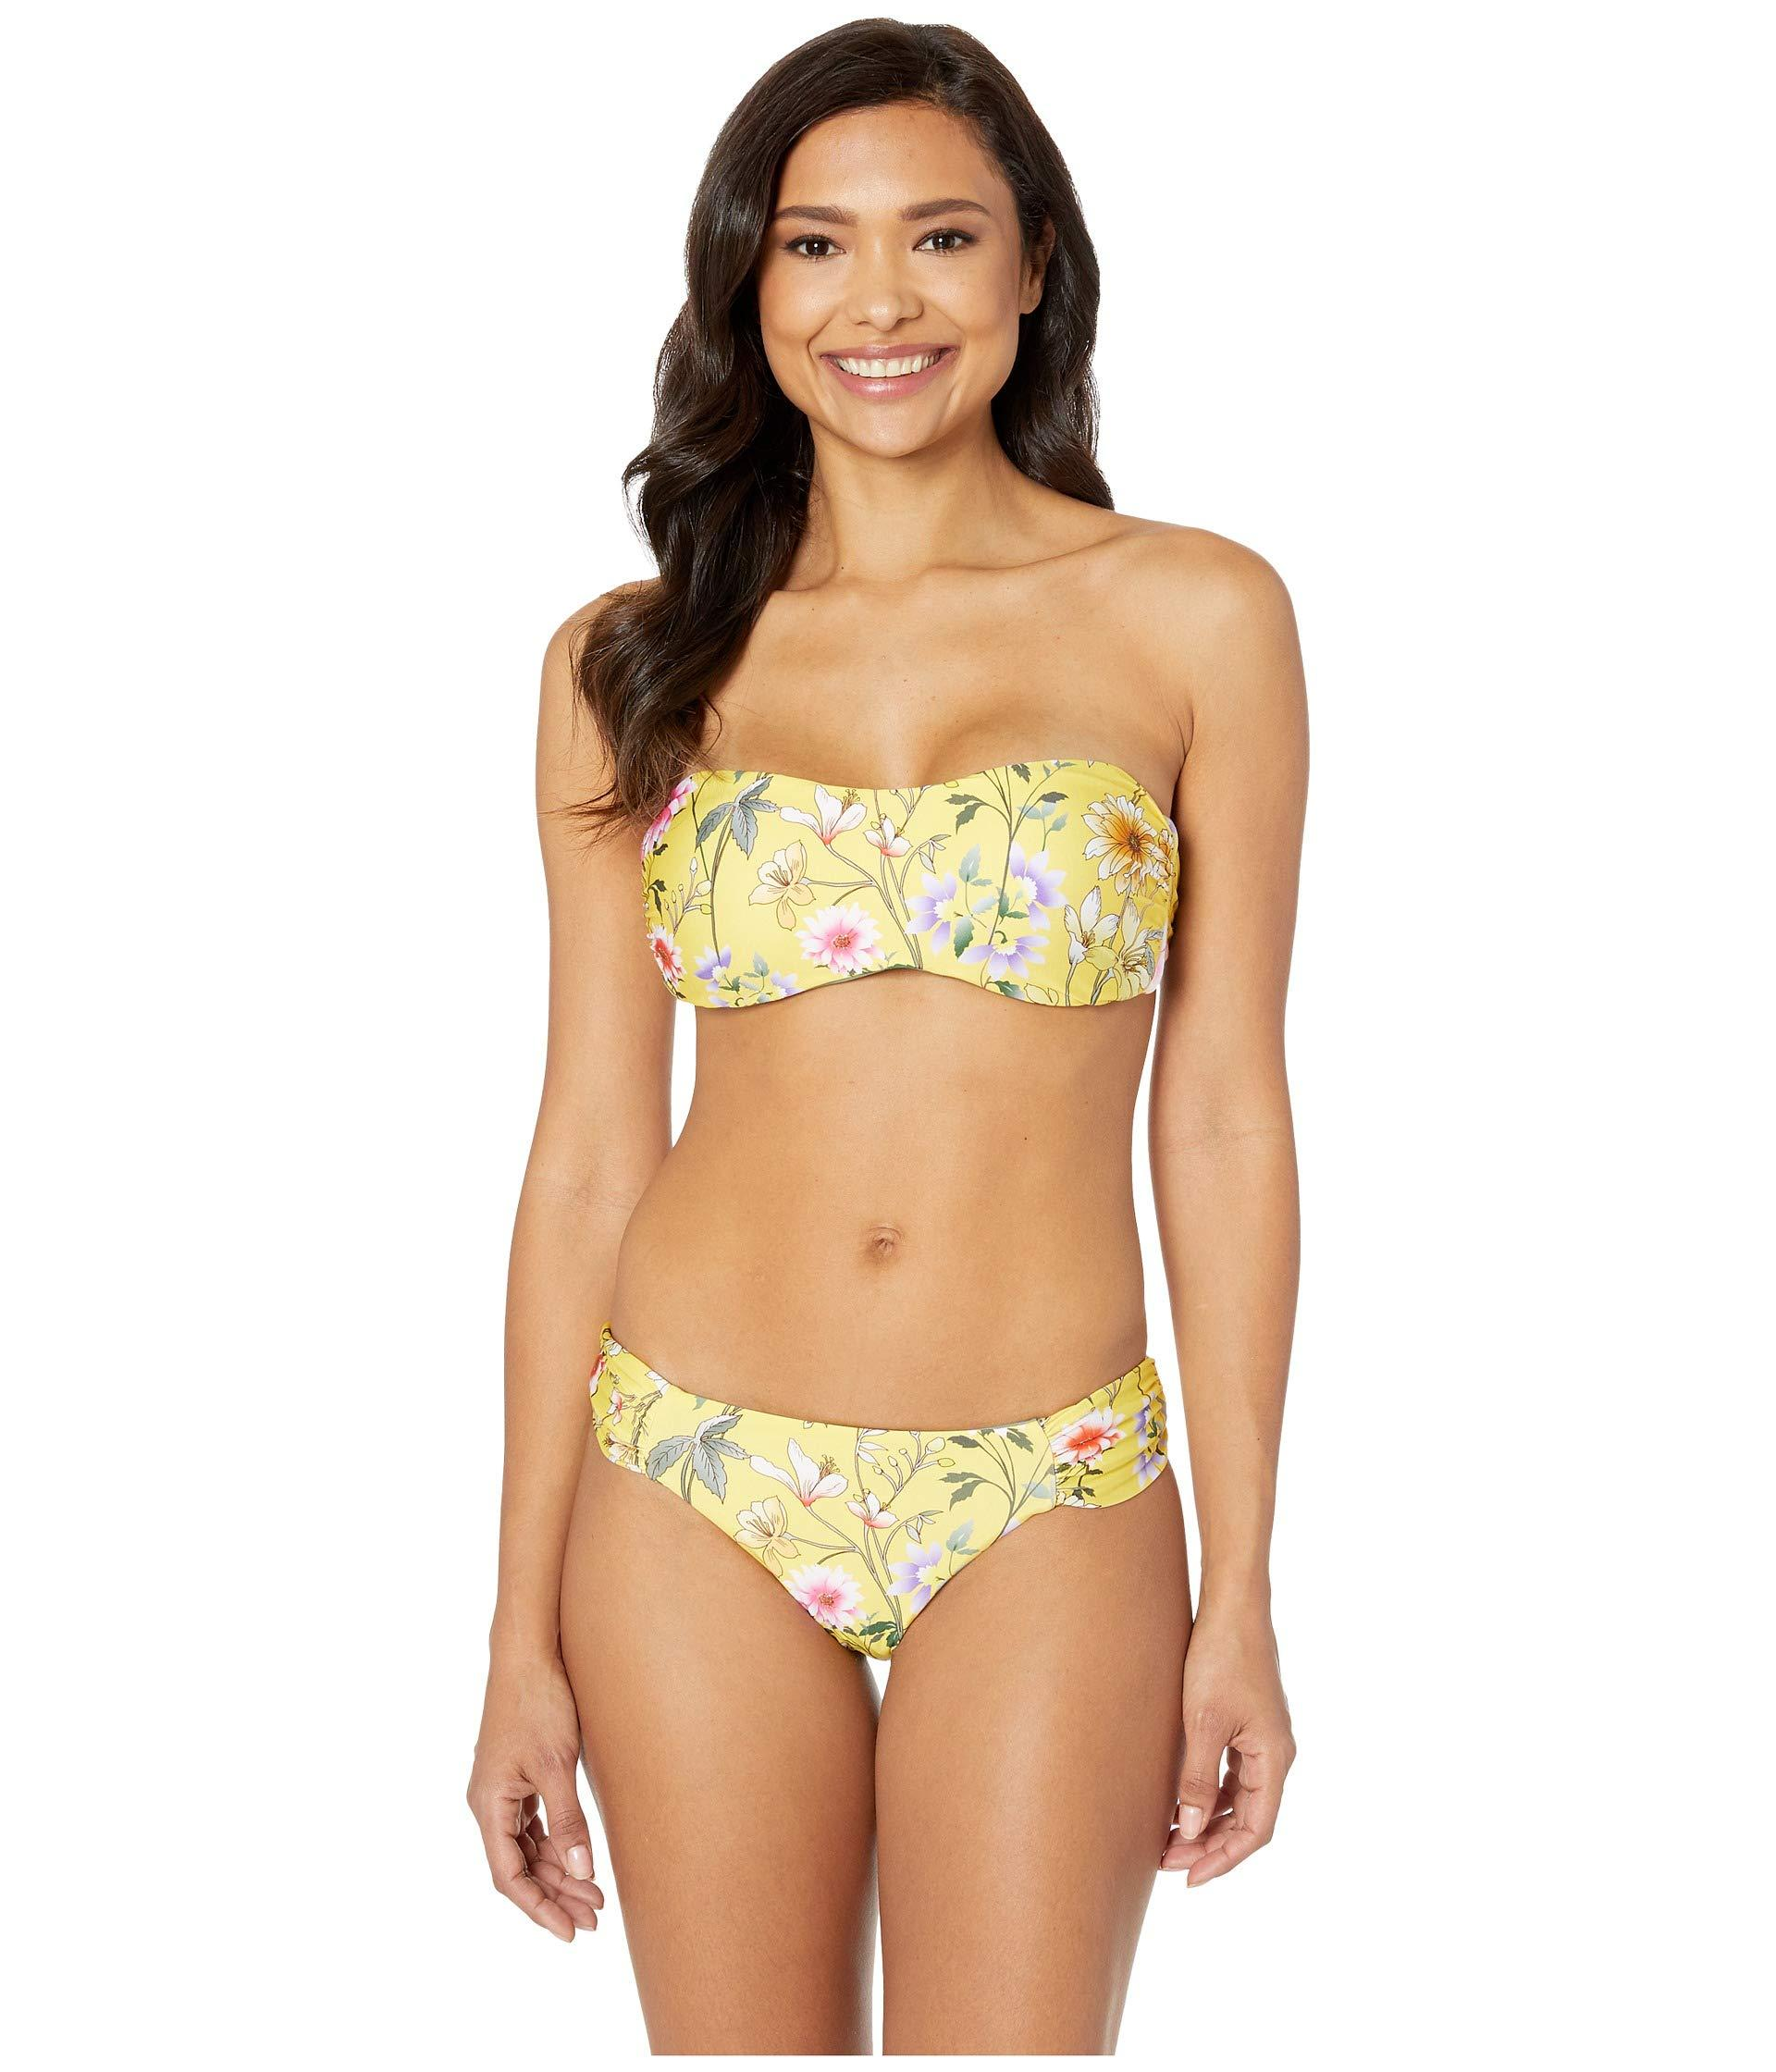 07afeee5b9dc2 ... Cruisin Coronado Reversible Side Shirred Pant Bottoms (multi) Women's  Swimwear. View fullscreen